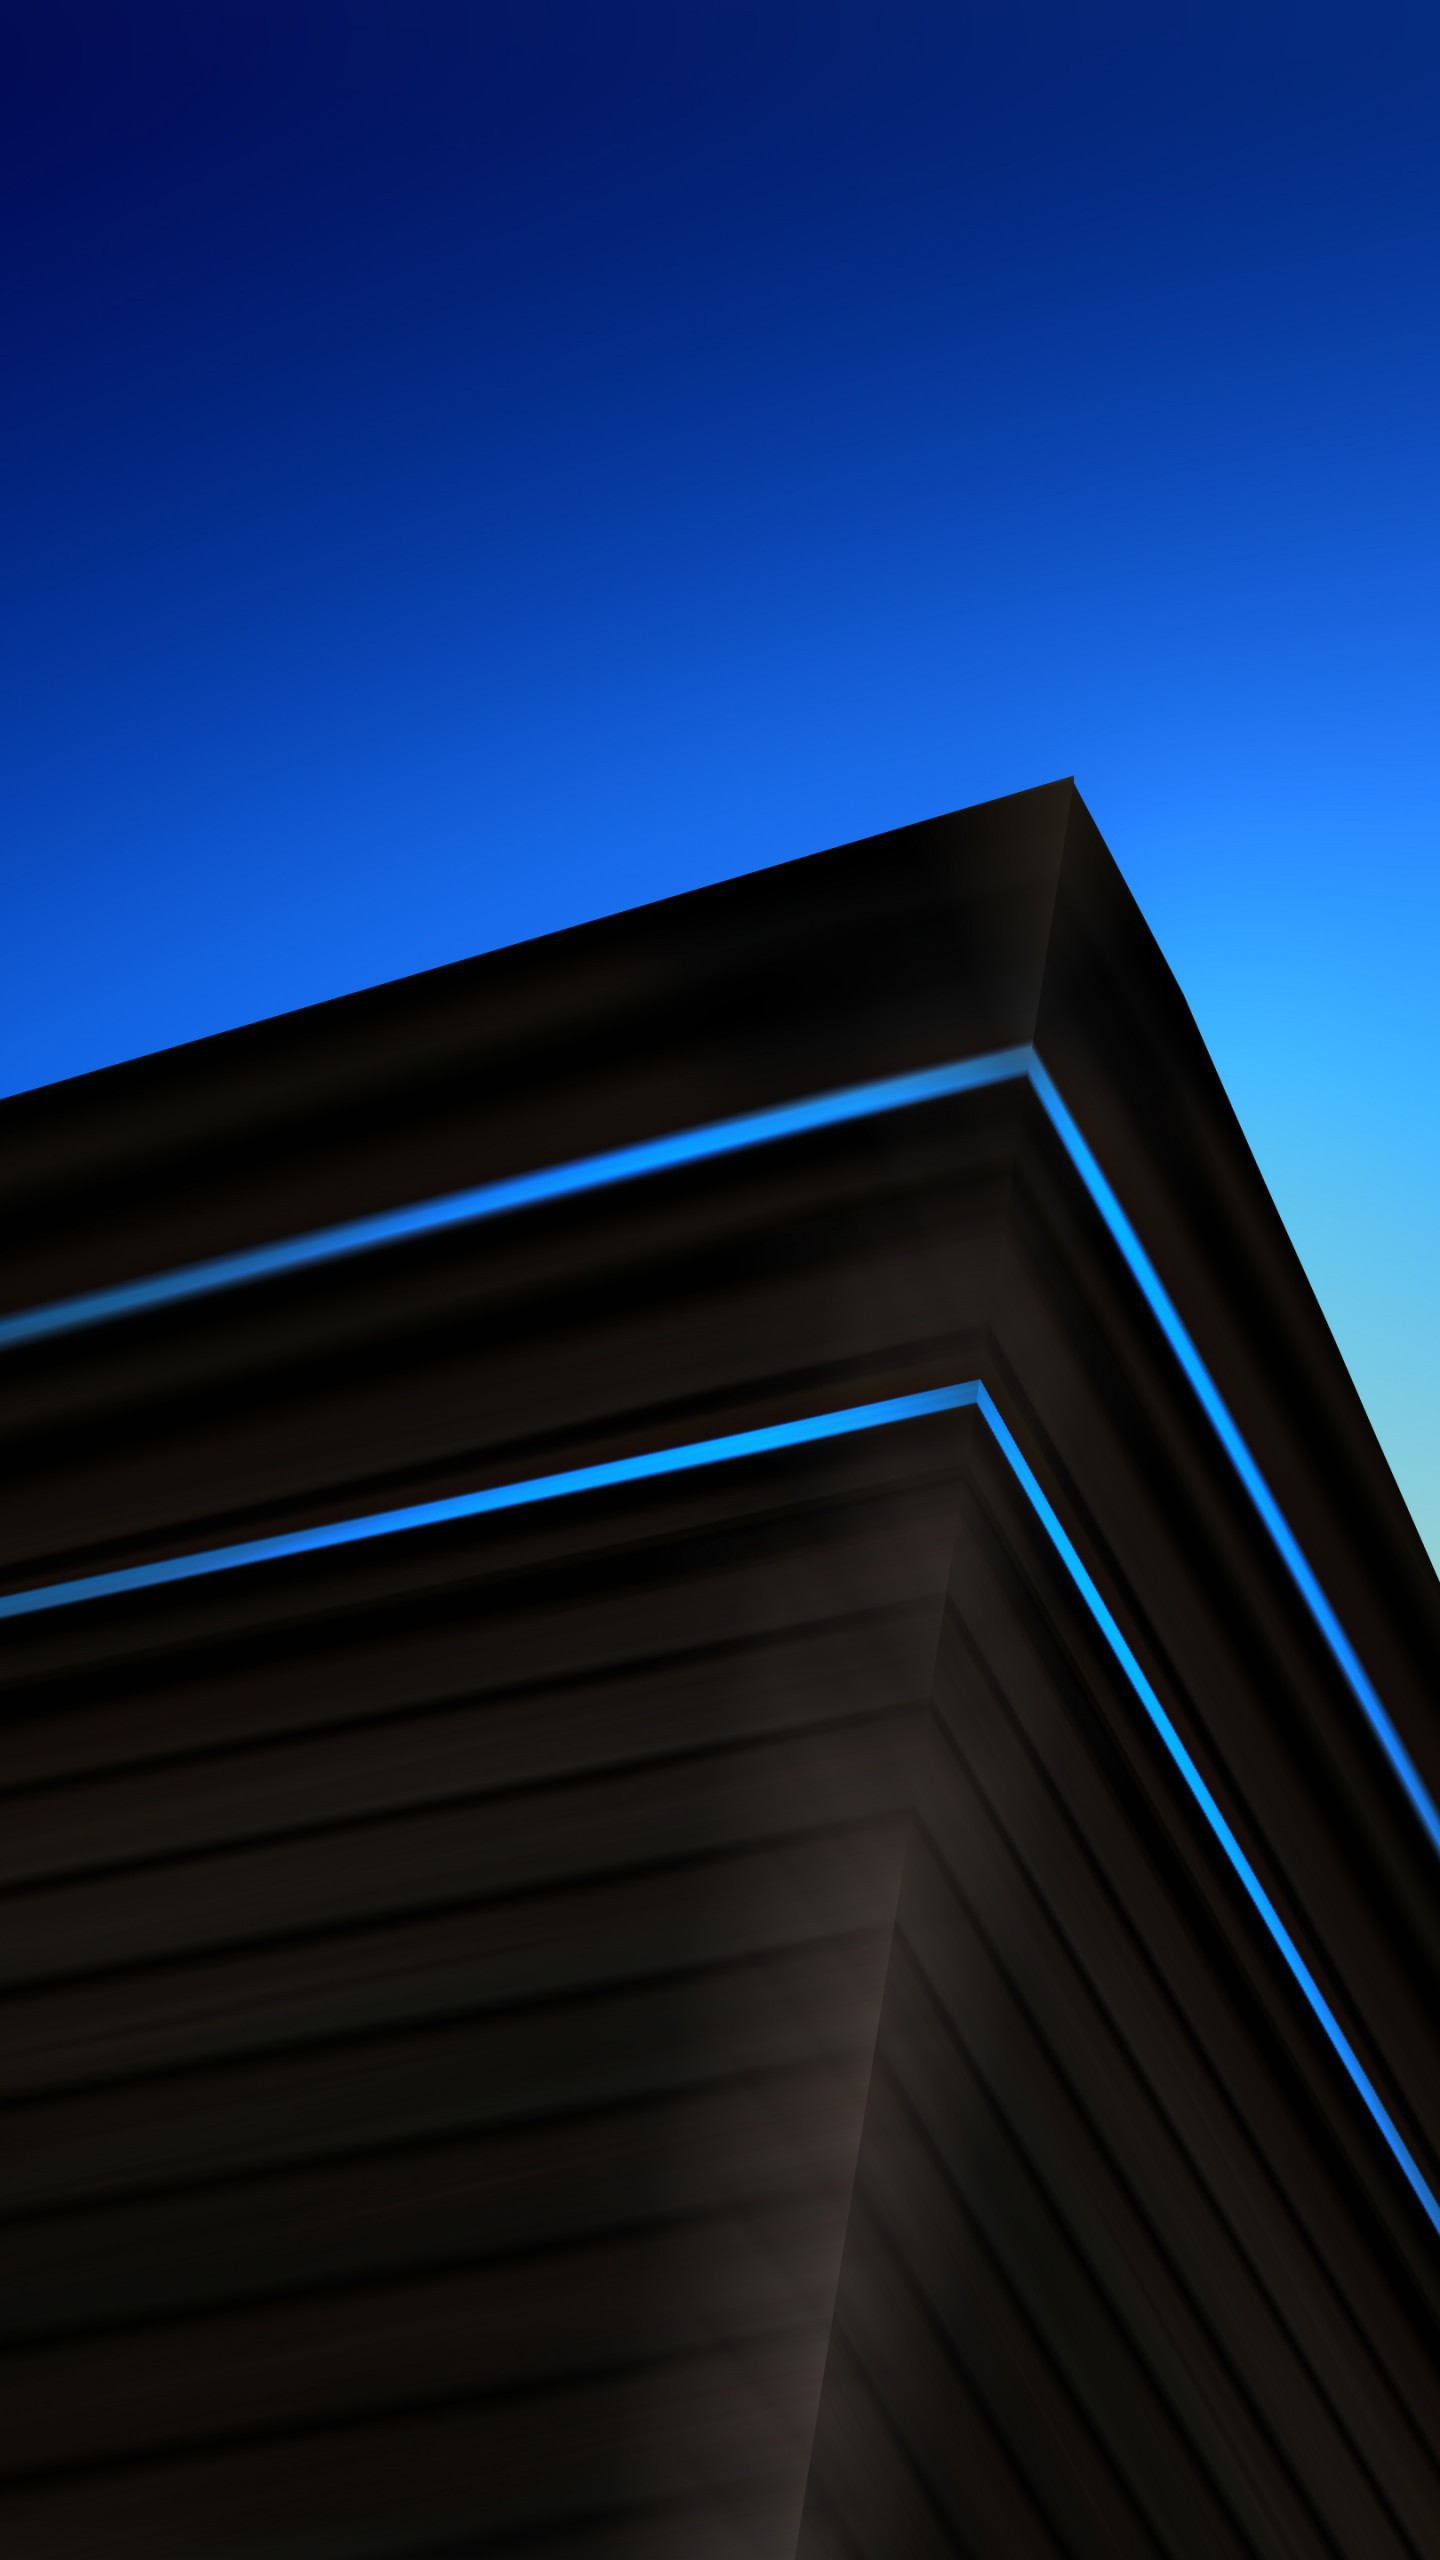 عکس زمینه گرافیک خلاق معماری مدرن آبی و مشکی پس زمینه